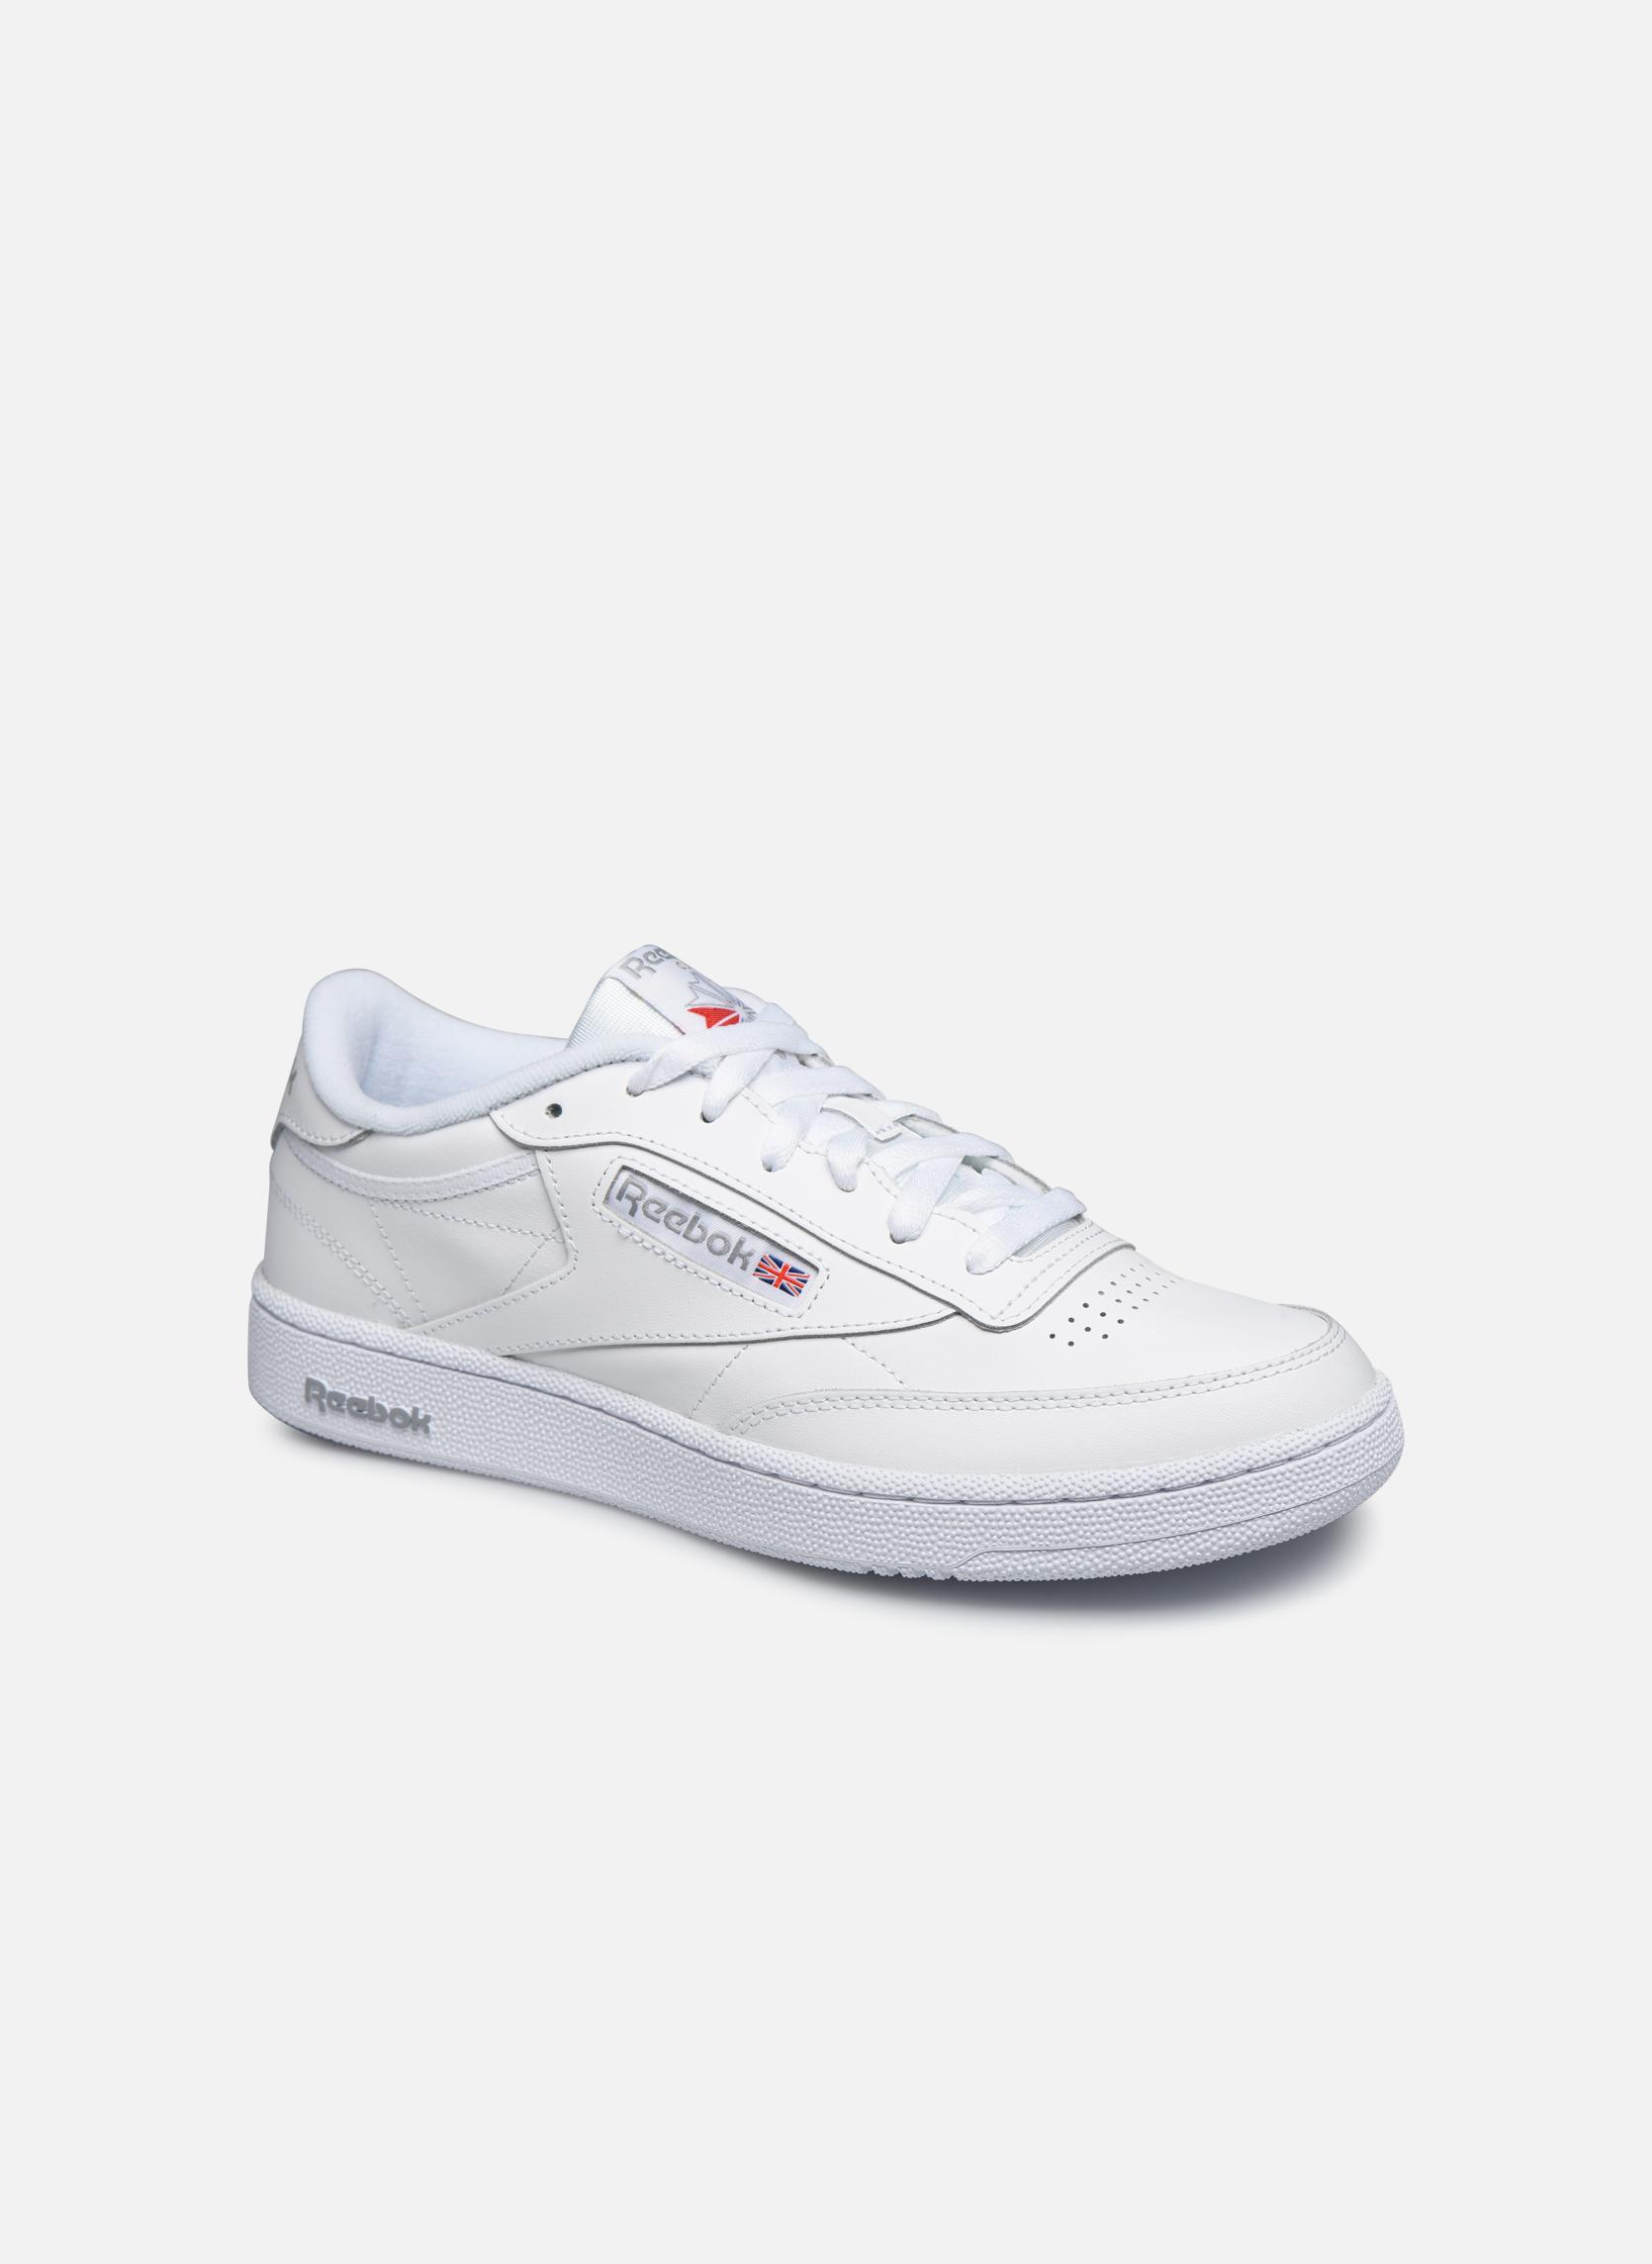 Club C 85 Int-White/Sheer Grey